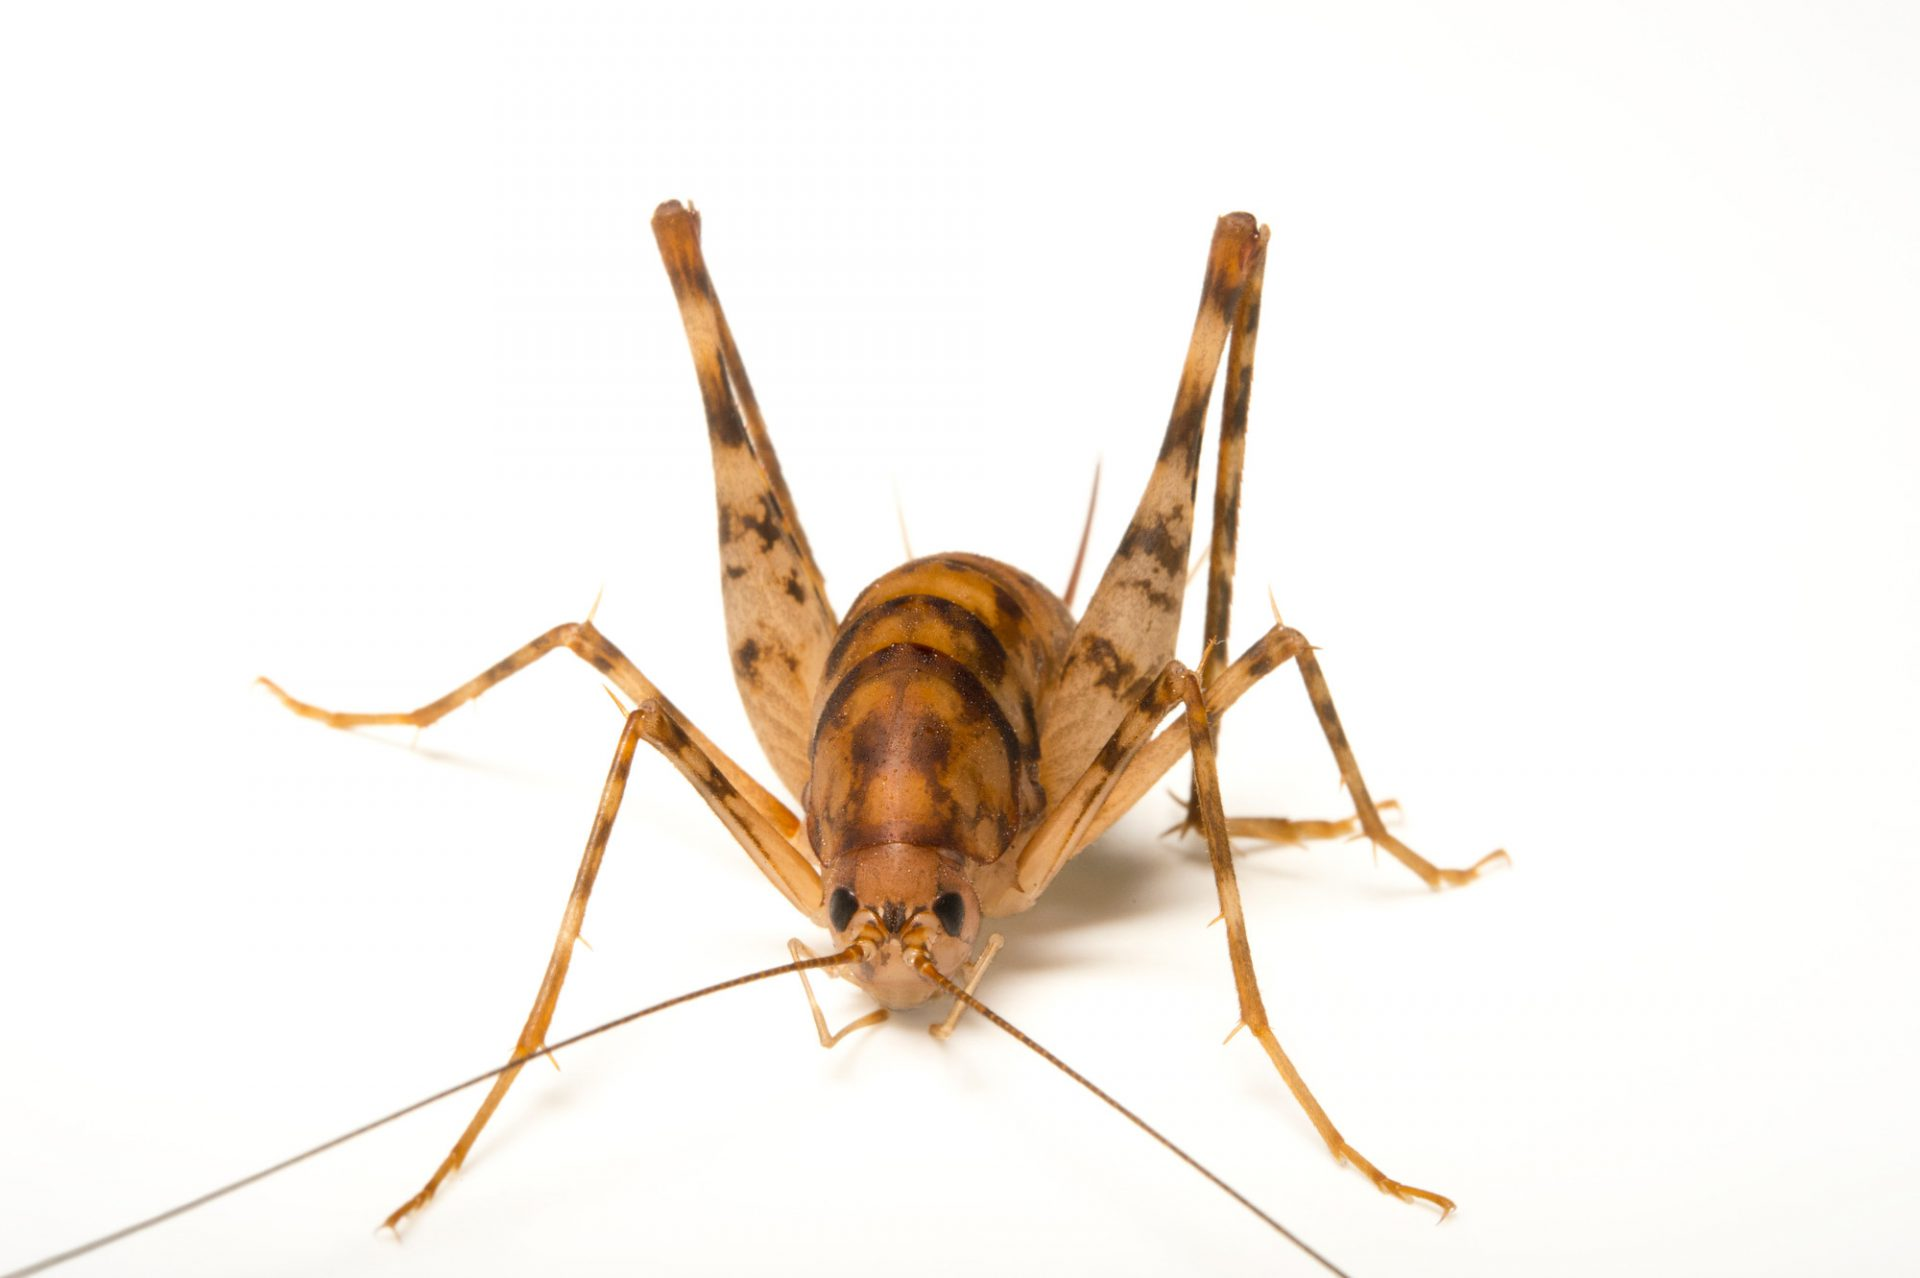 Photo: Cave cricket (Ceuthophilus gracilipes) at the St. Louis Zoo.